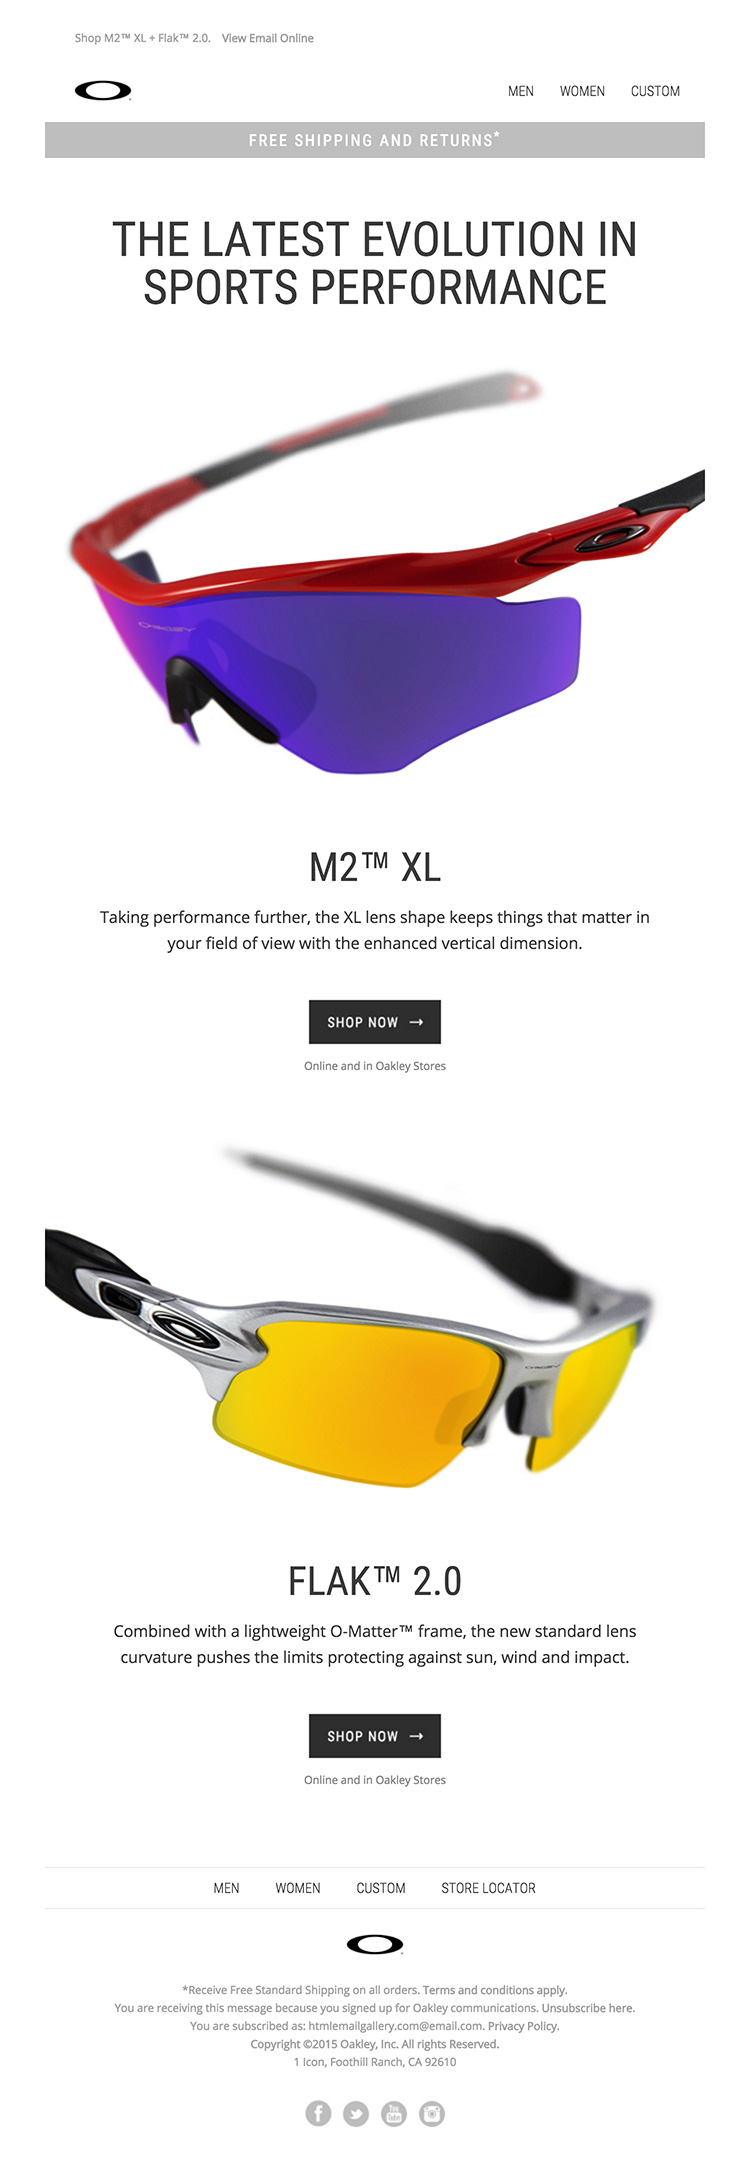 Minimal eCommerce html email design